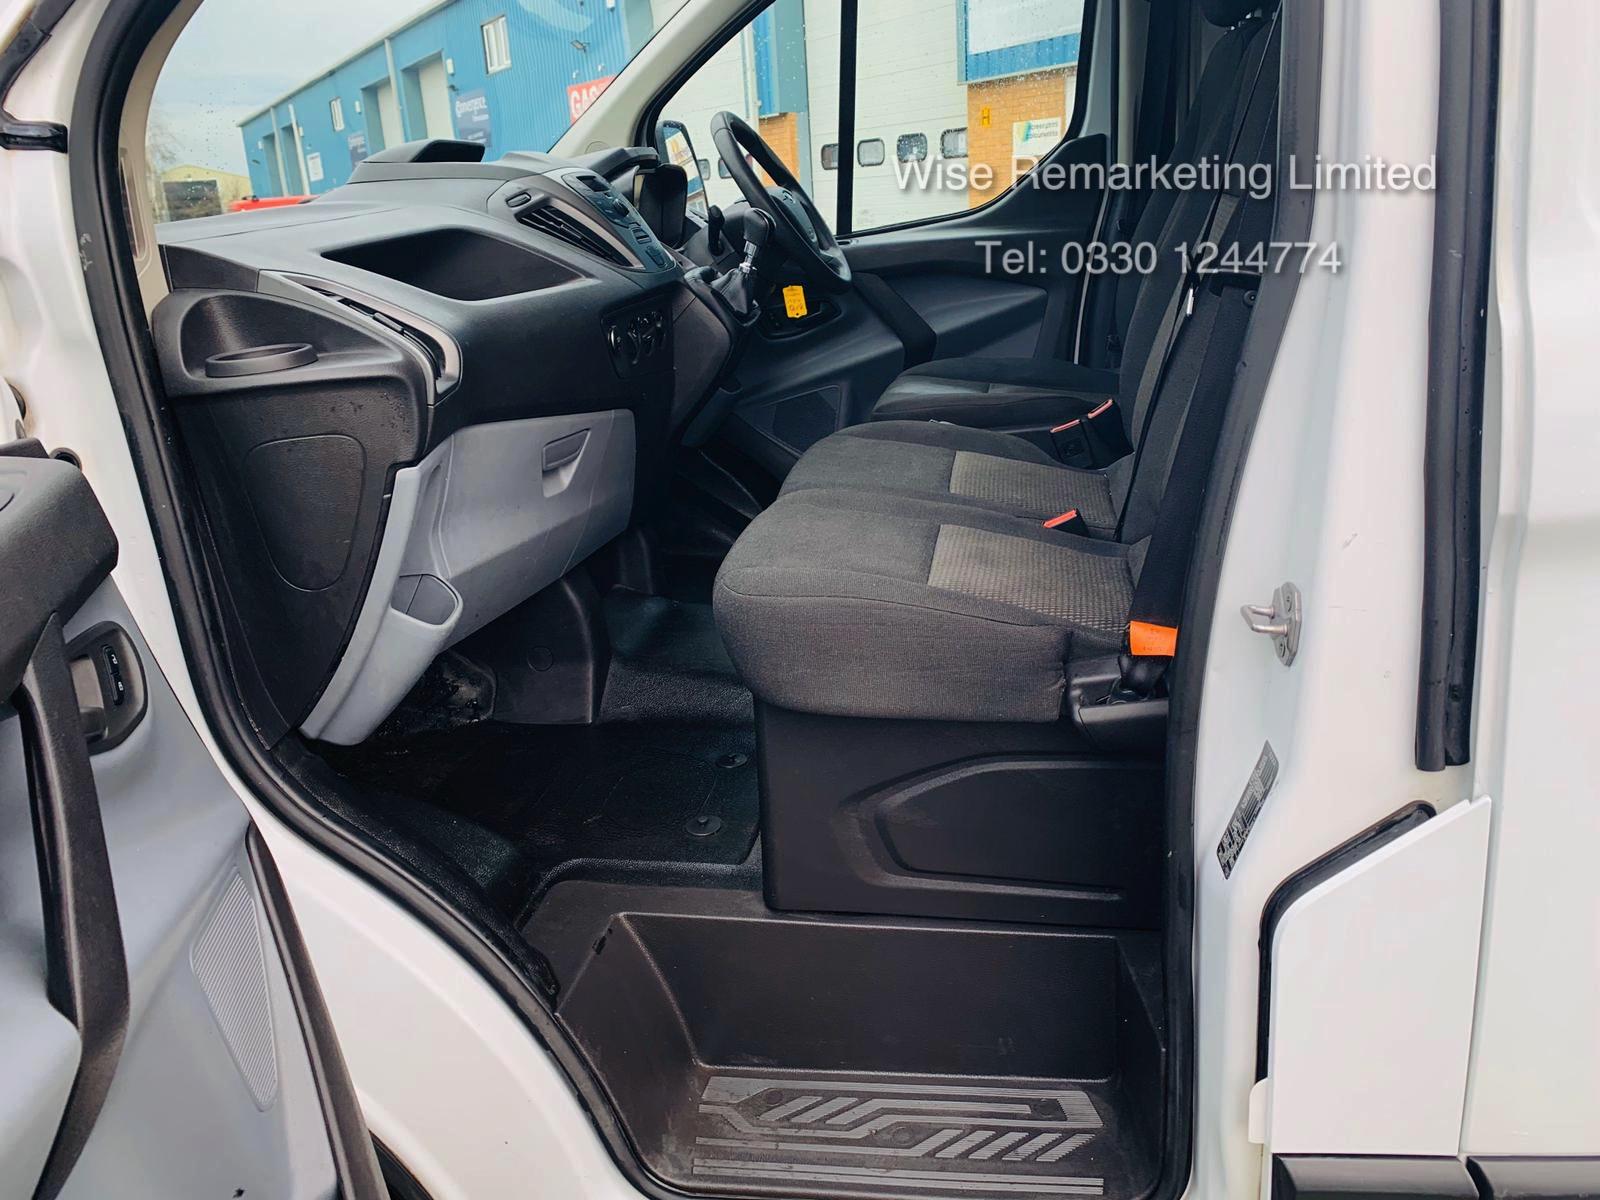 Ford Transit Custom 2.2 TDCI 290 **HIGH ROOF** - 2016 Model - AIR CON- 1 OWNER- FSH- RARE VAN!! - Image 12 of 24